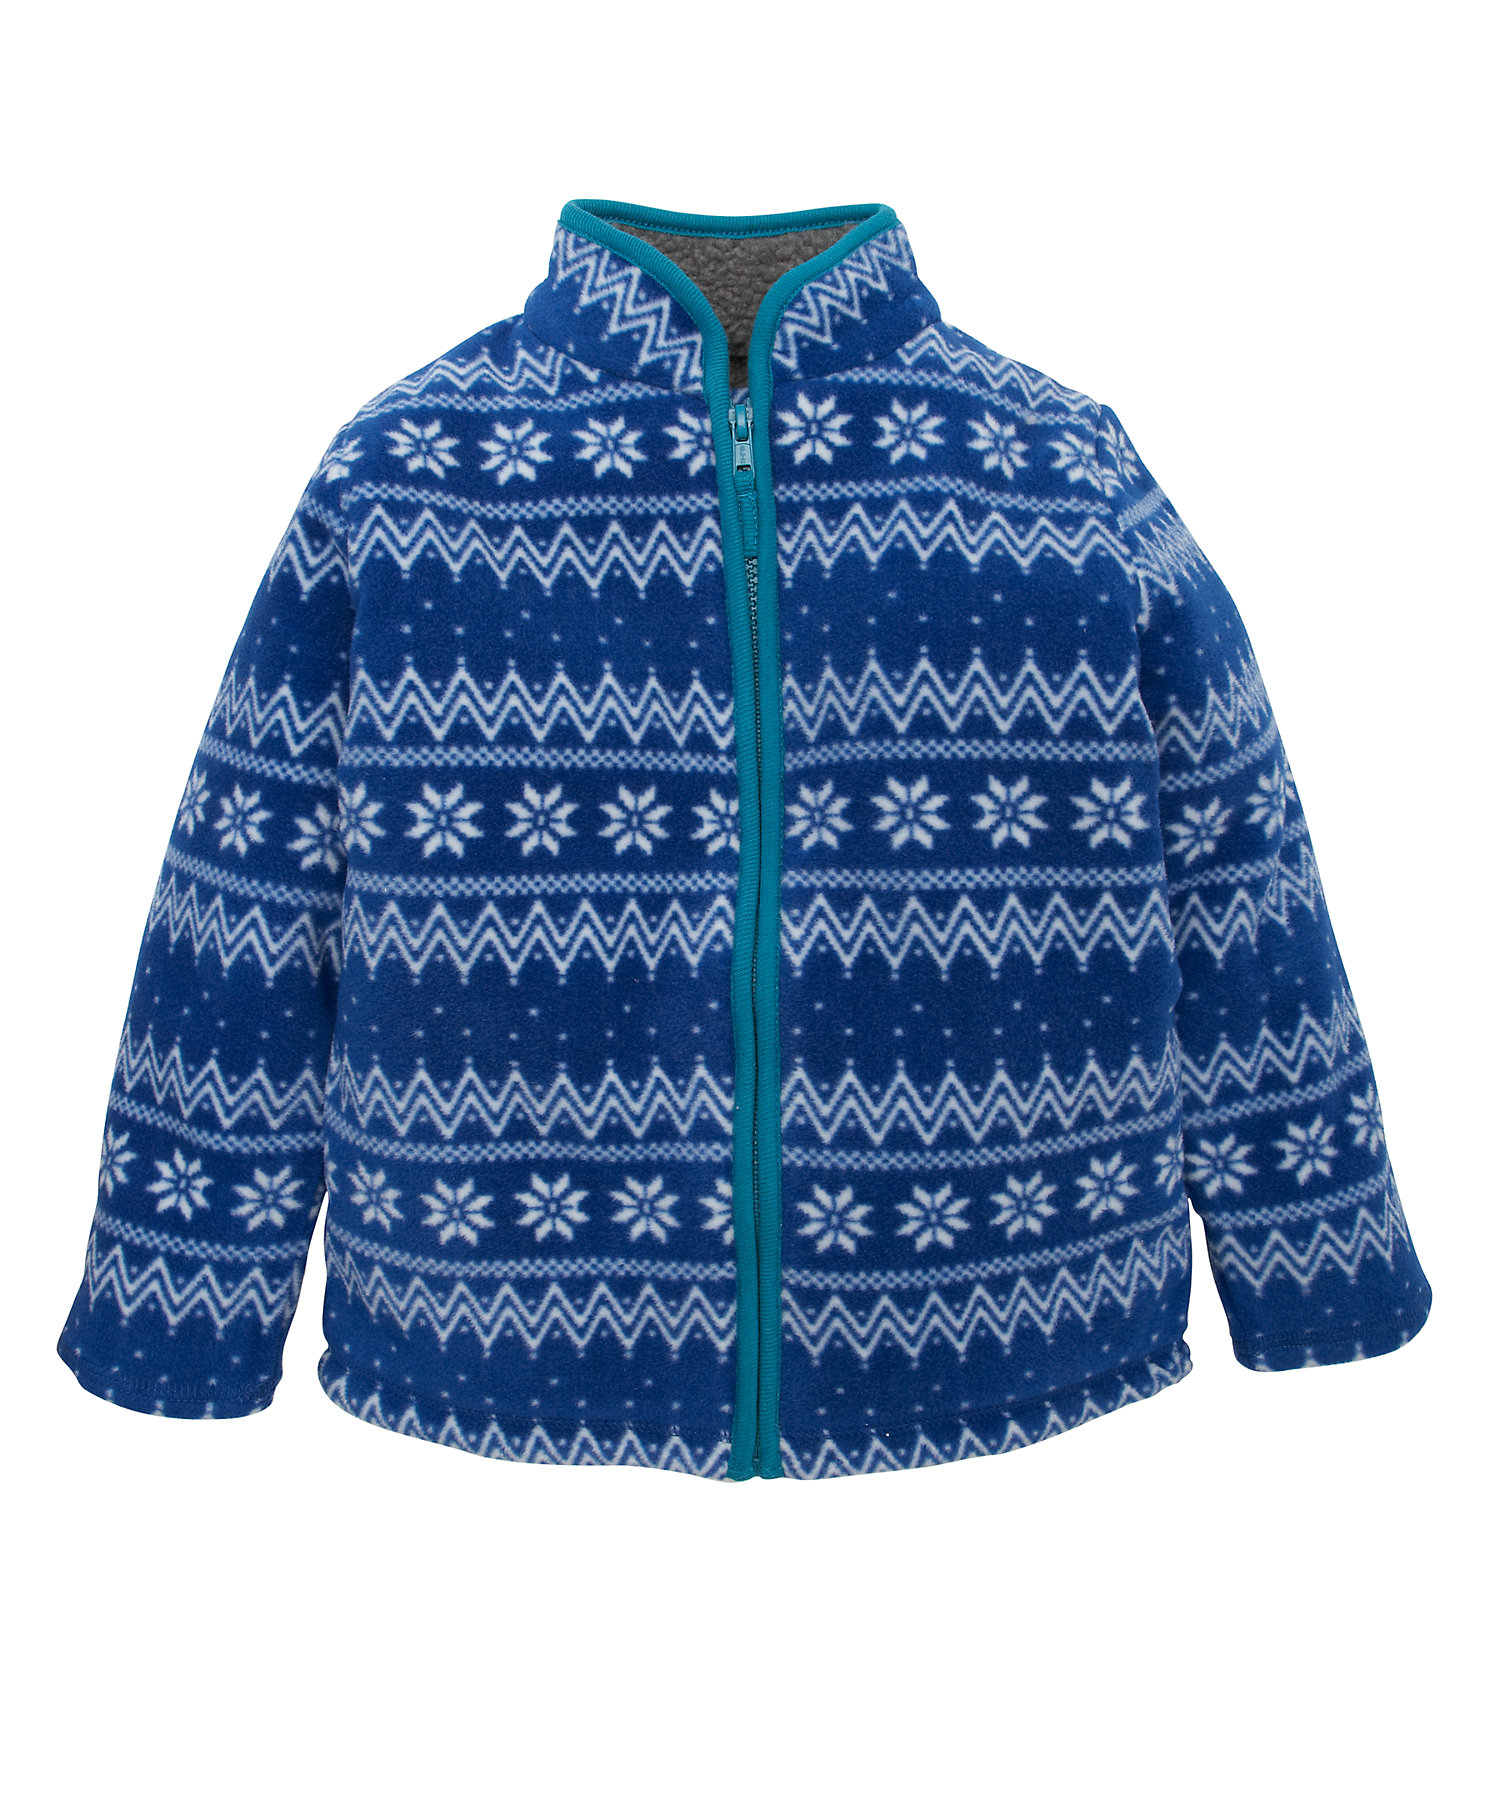 Mothercare | Boys Full Sleeves Fleece Jacket Fair isle Design - Blue